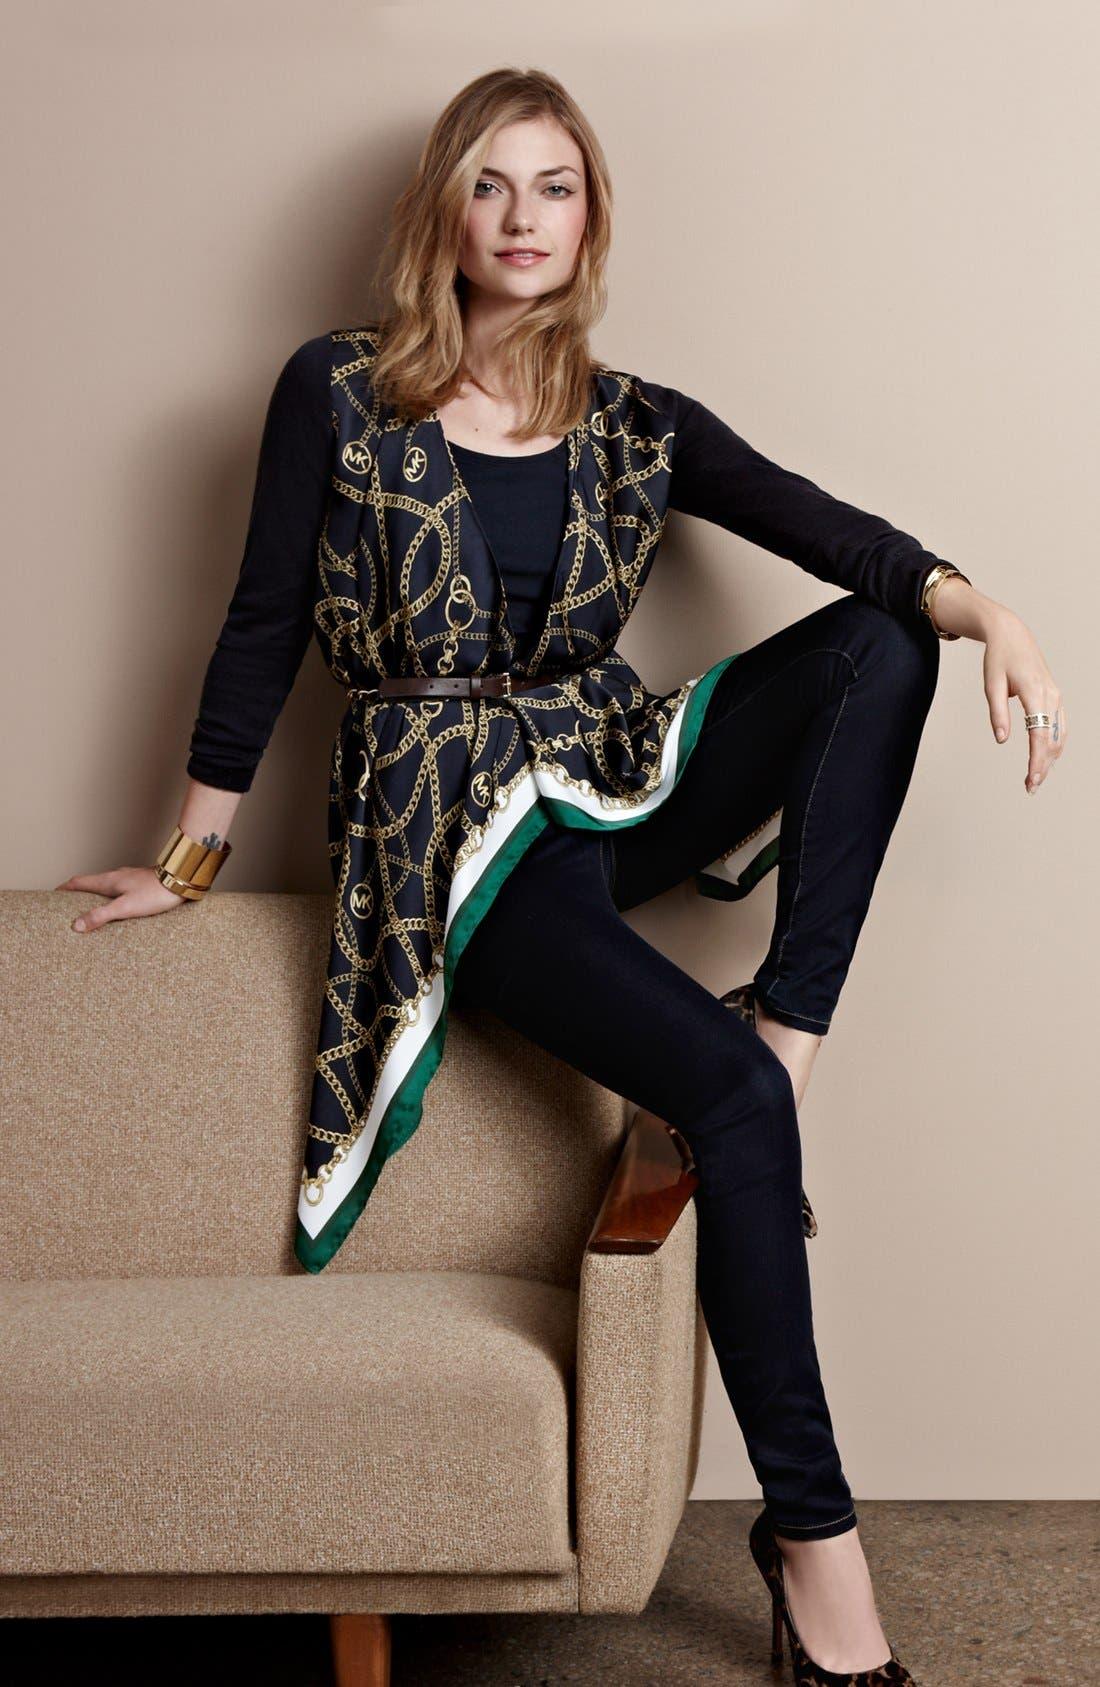 Alternate Image 1 Selected - MICHAEL Michael Kors Cardigan, Skinny Jeans & Accessories